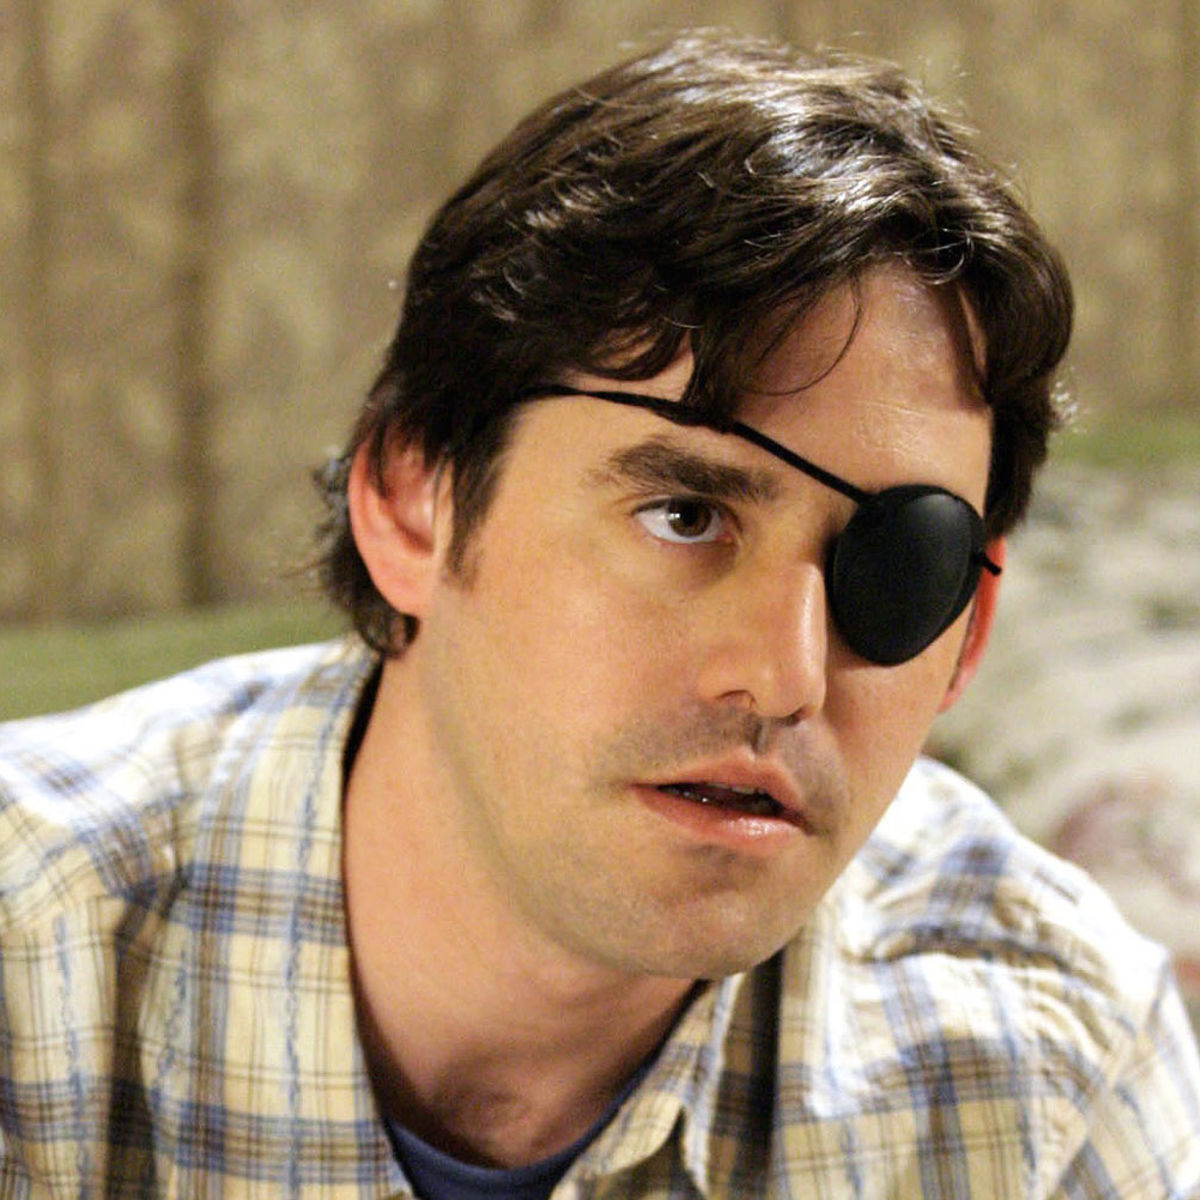 eyepatches-brendon-buffy1.jpg